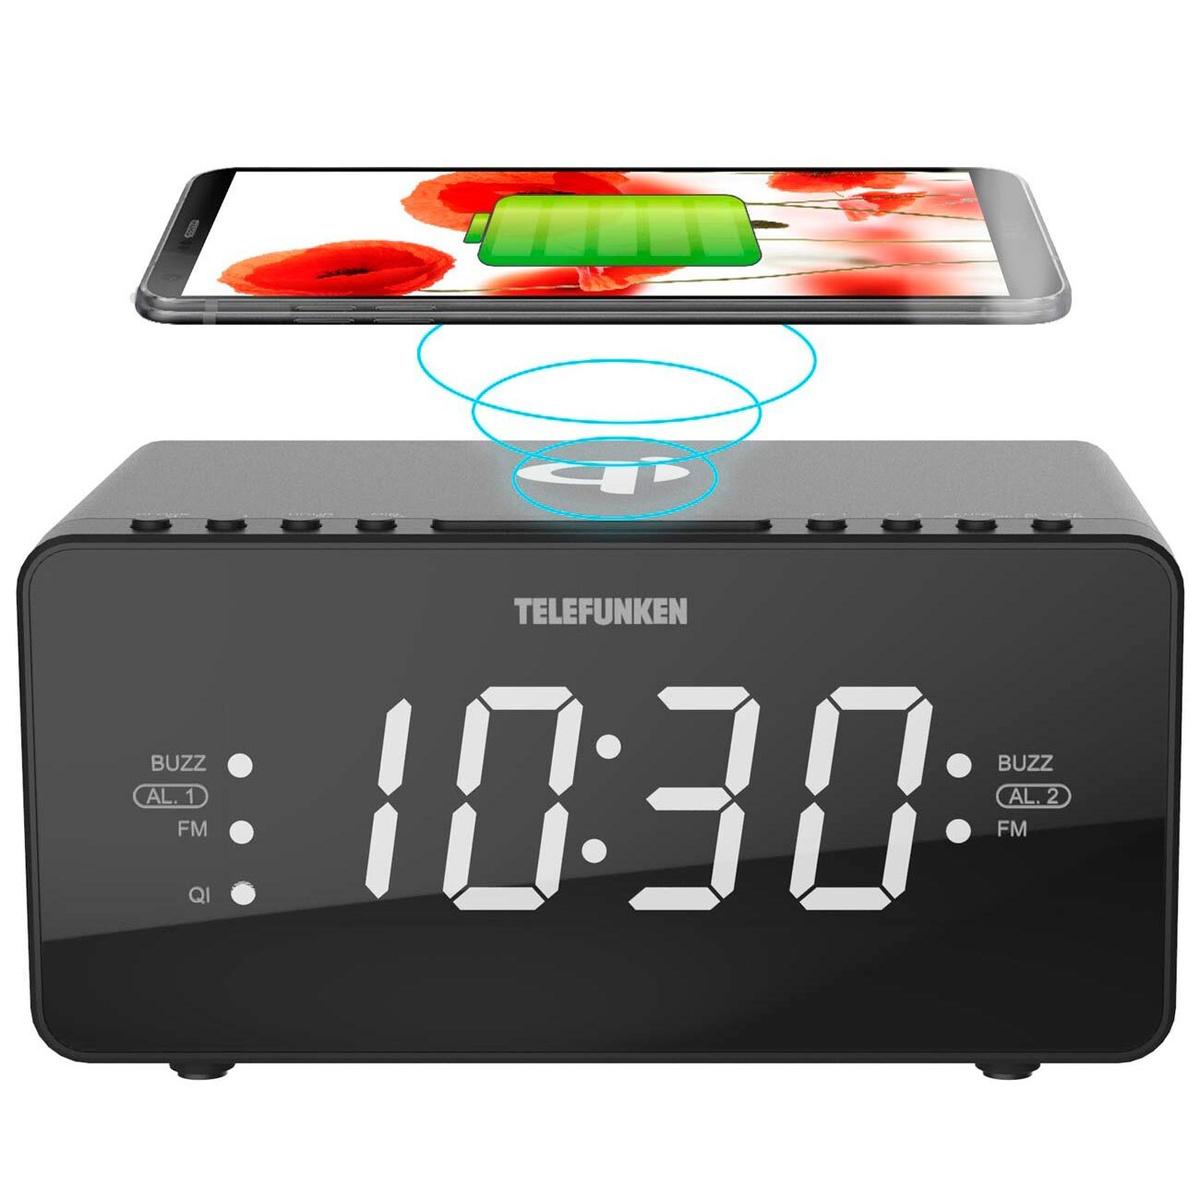 Telefunken Радио-часы TF-1594U Black #1